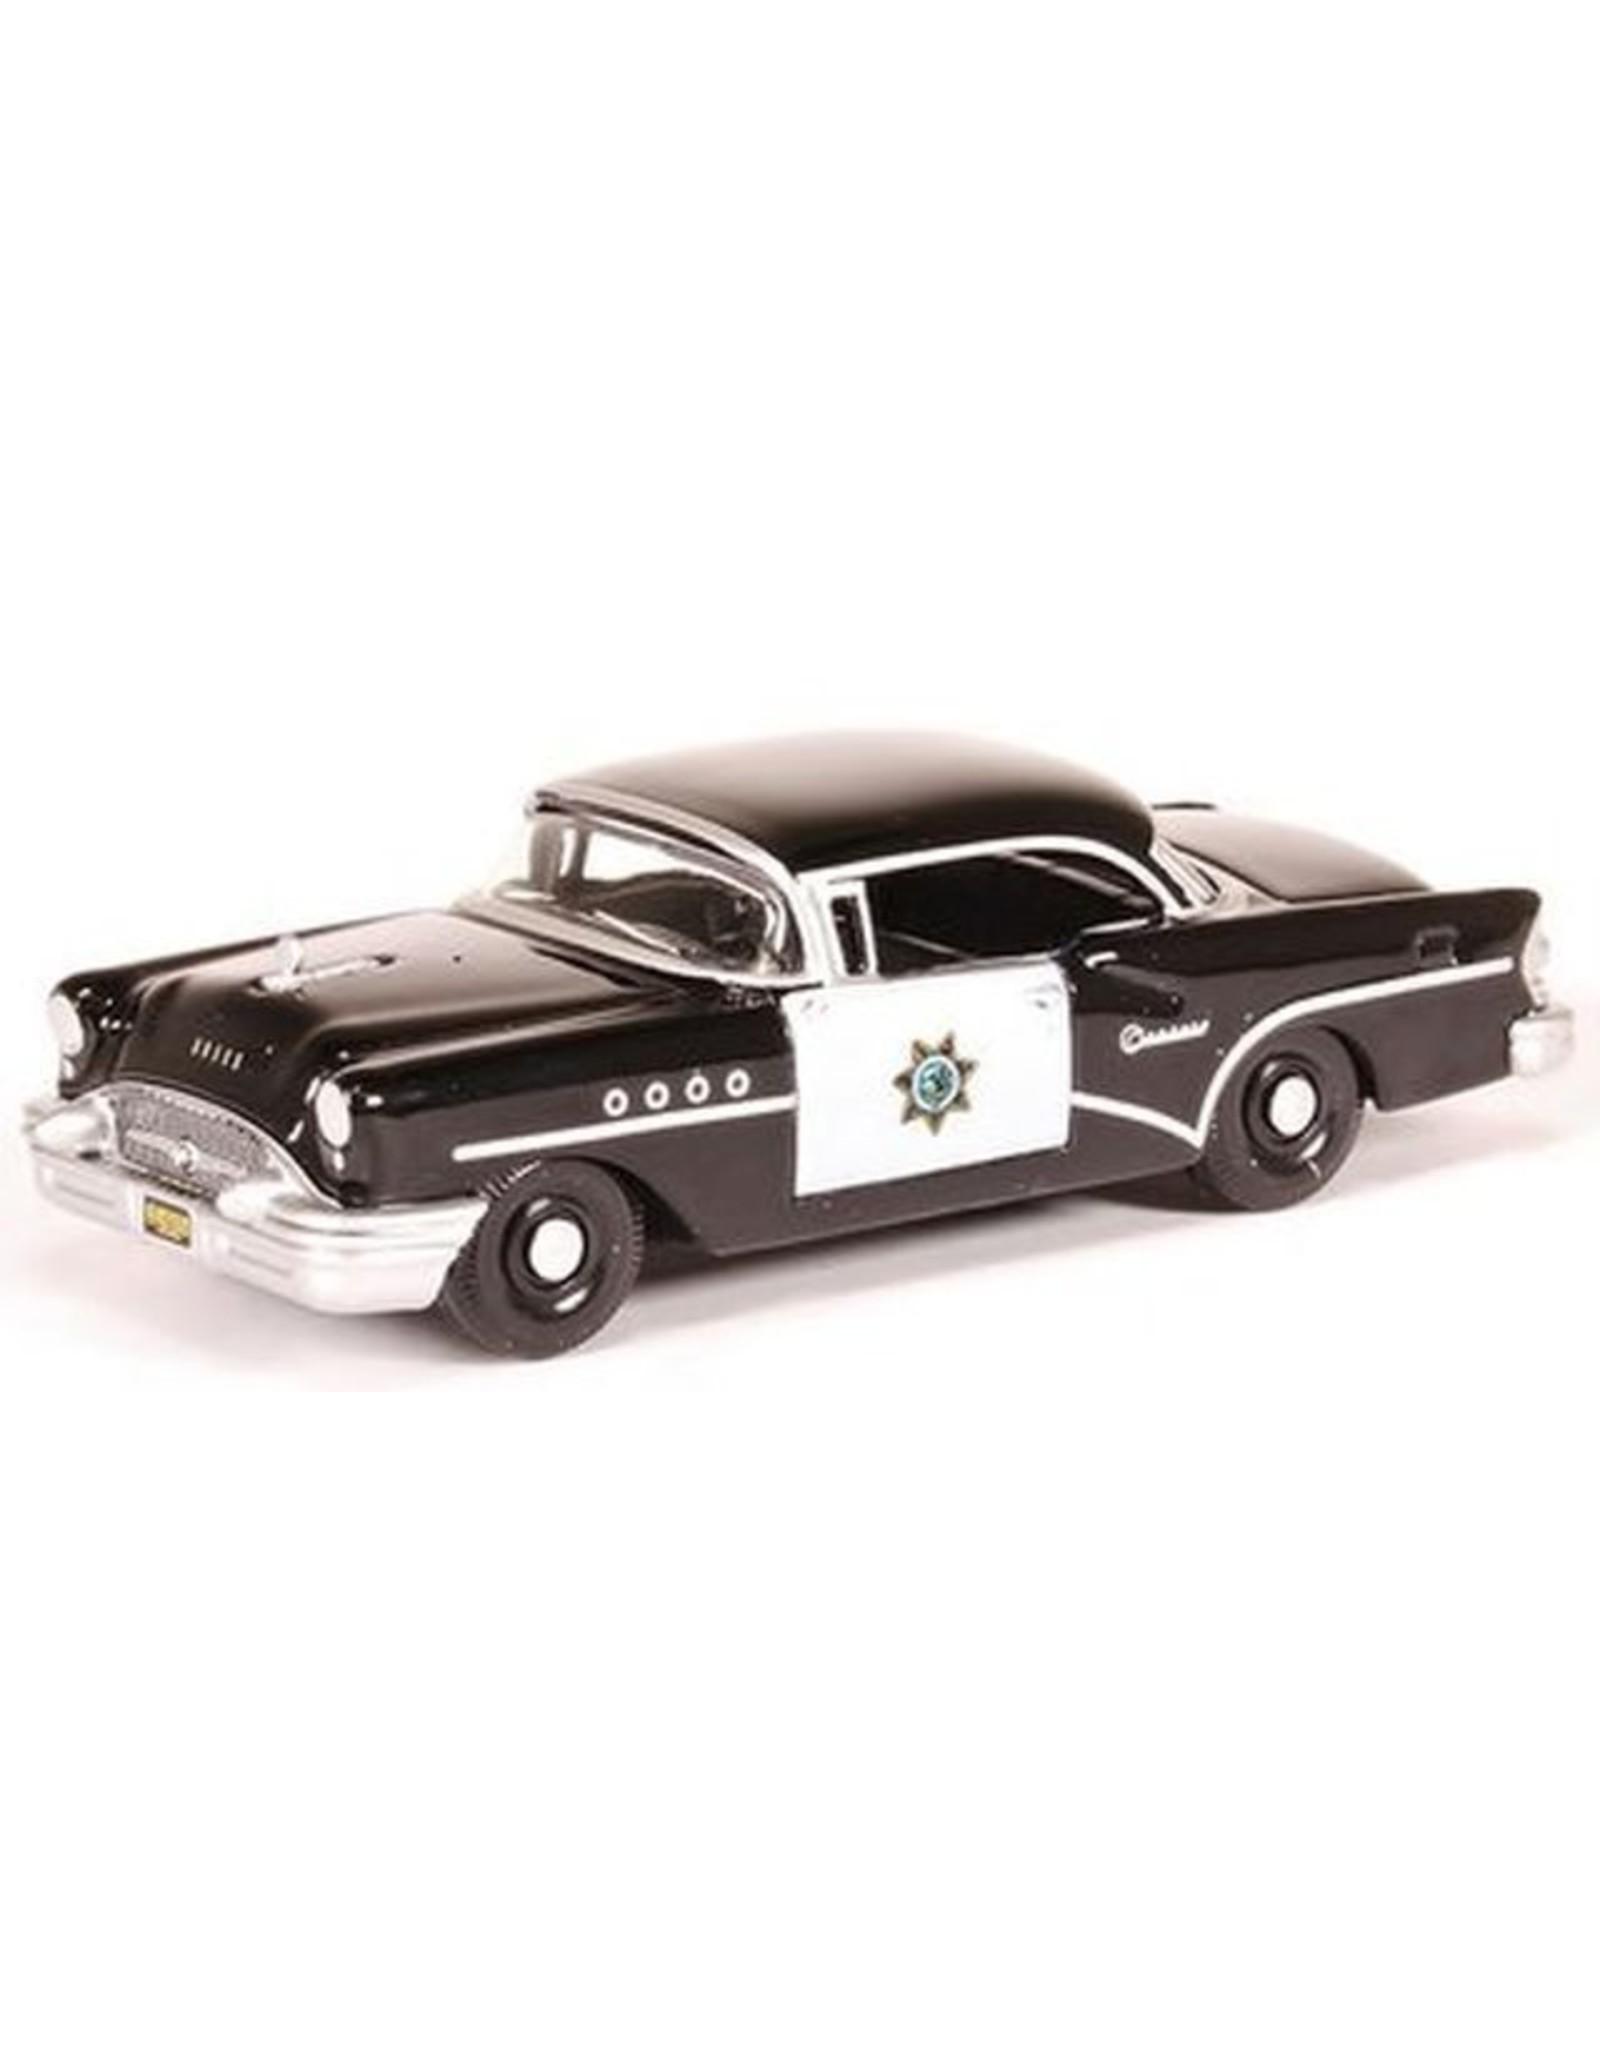 Buick BUICK CENTURY,CALIFORNIA HIGHWAY PATROL